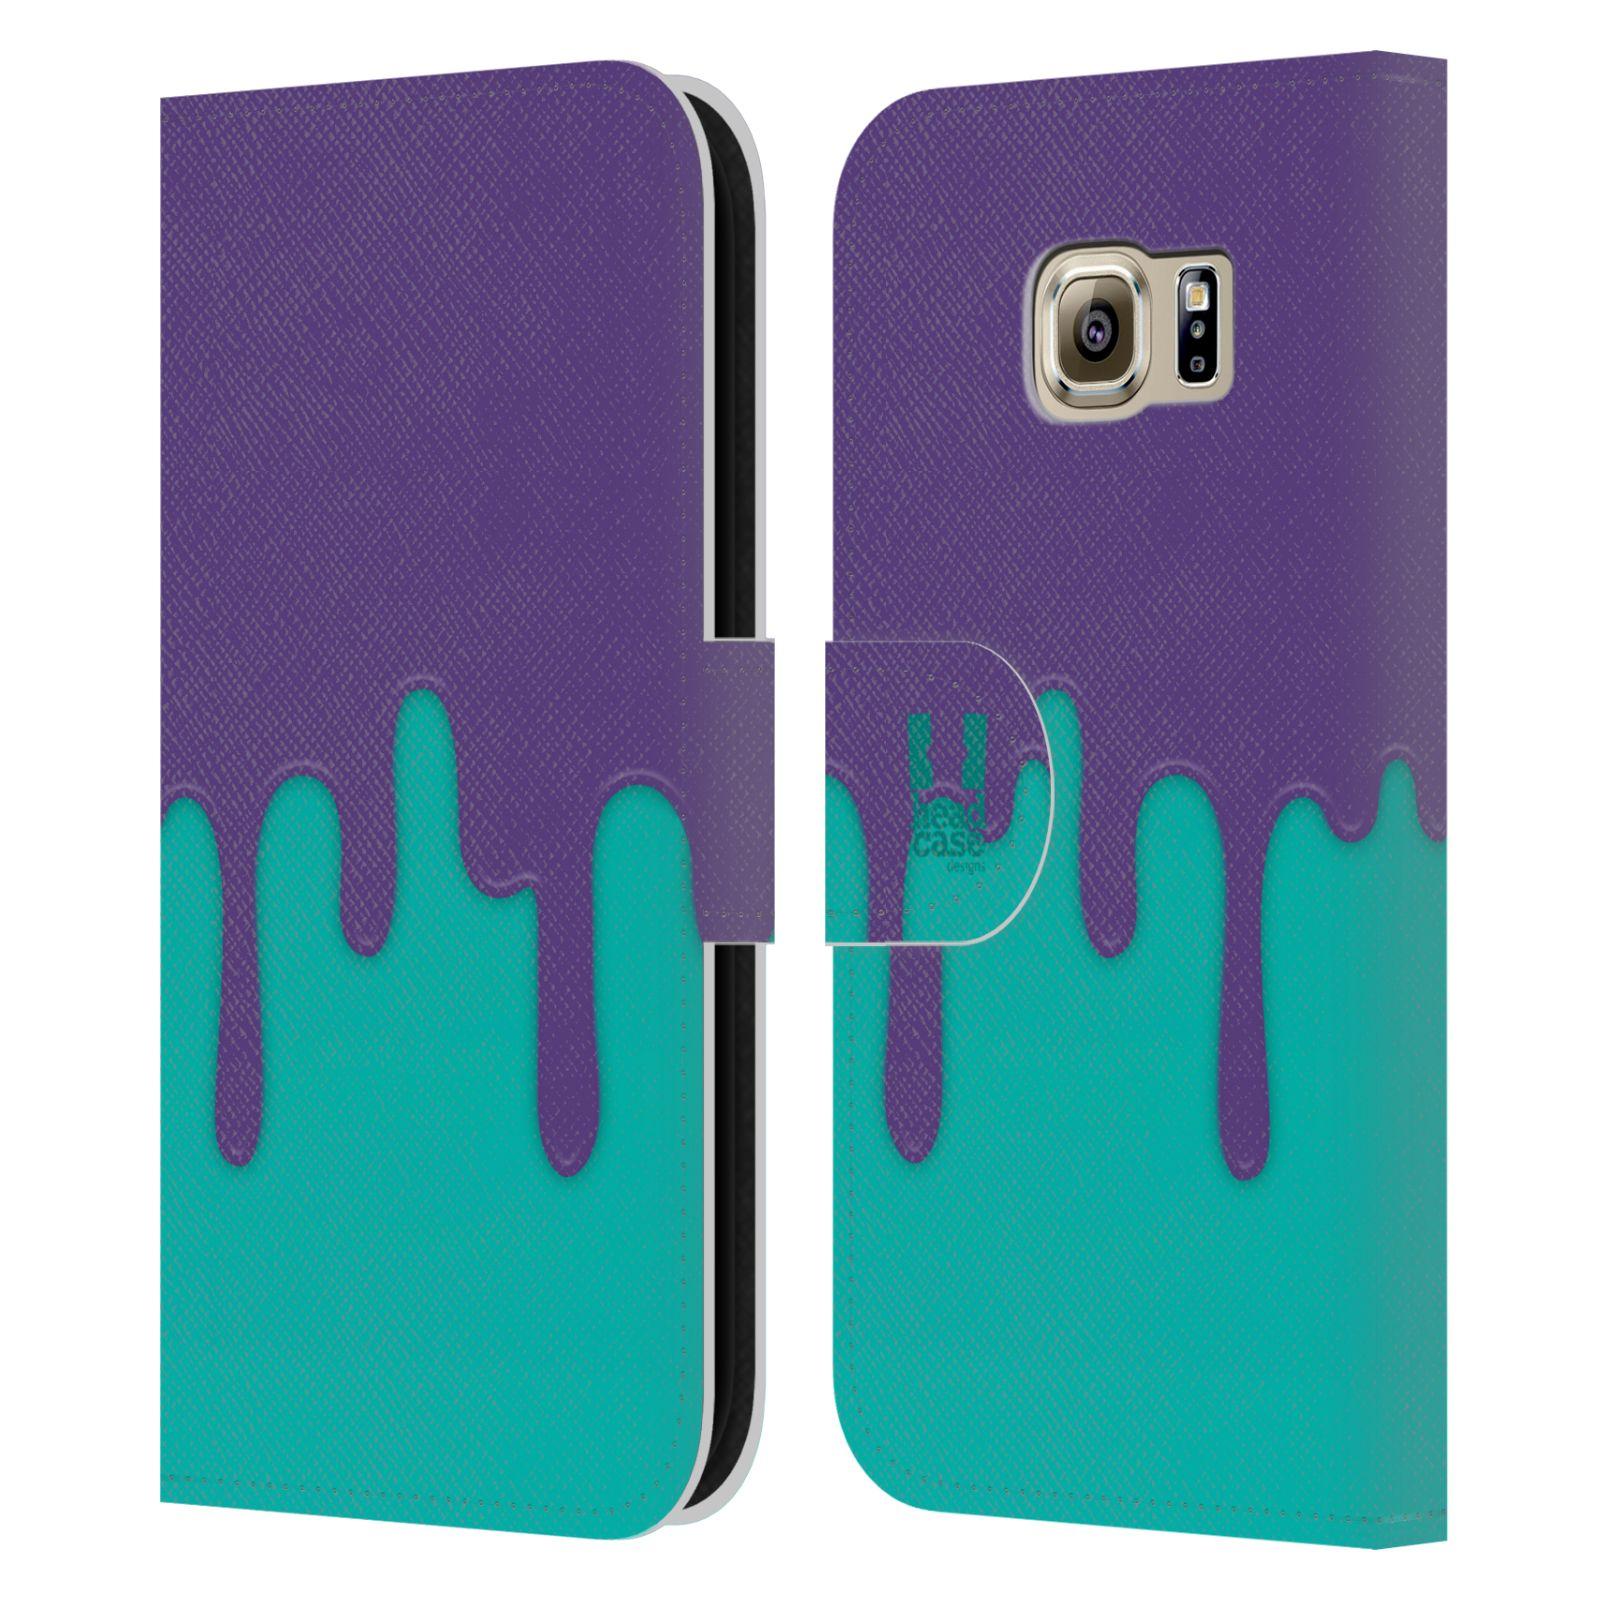 HEAD CASE Flipové pouzdro pro mobil Samsung Galaxy S6 (G9200) Rozlitá barva fialová a tyrkysová